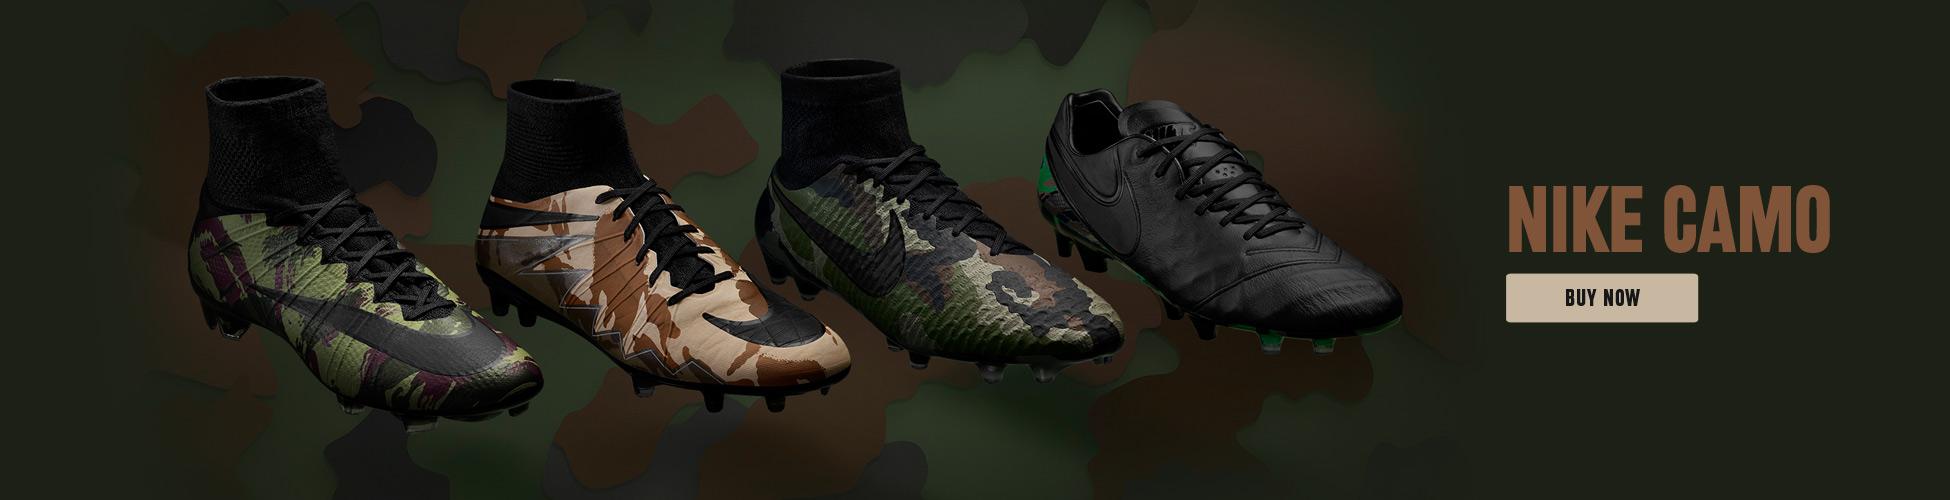 Botas Nike Camo Pack IN